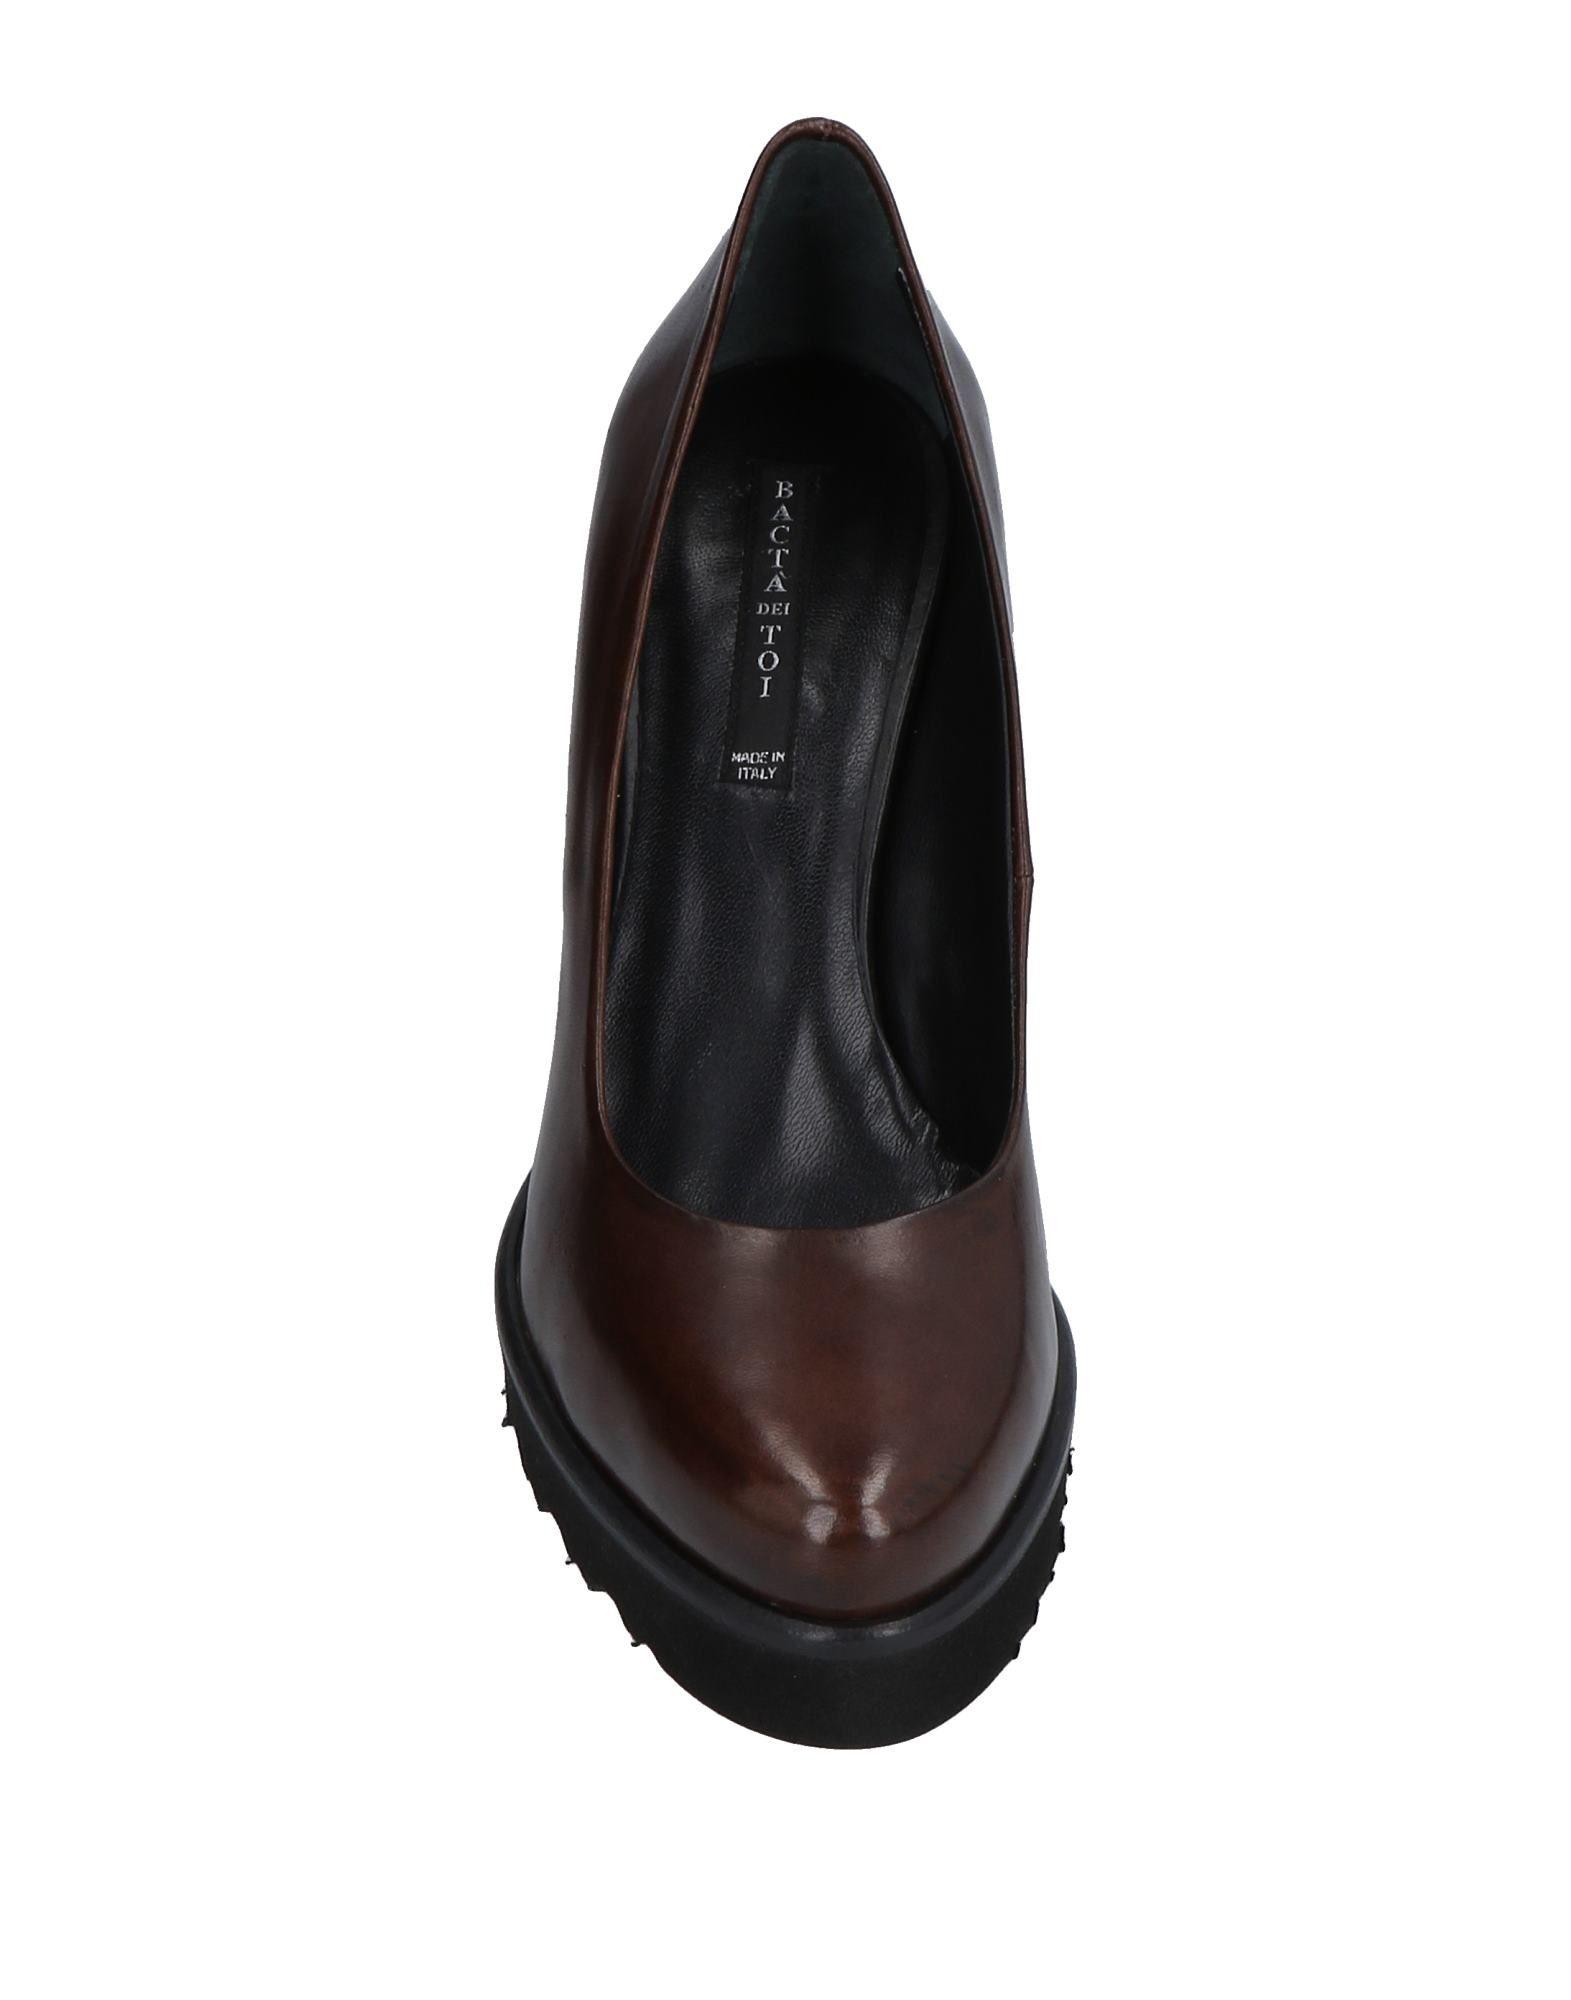 Stilvolle billige Pumps Schuhe Bactá Dei Toi Pumps billige Damen  11495573XB 0ec7bc